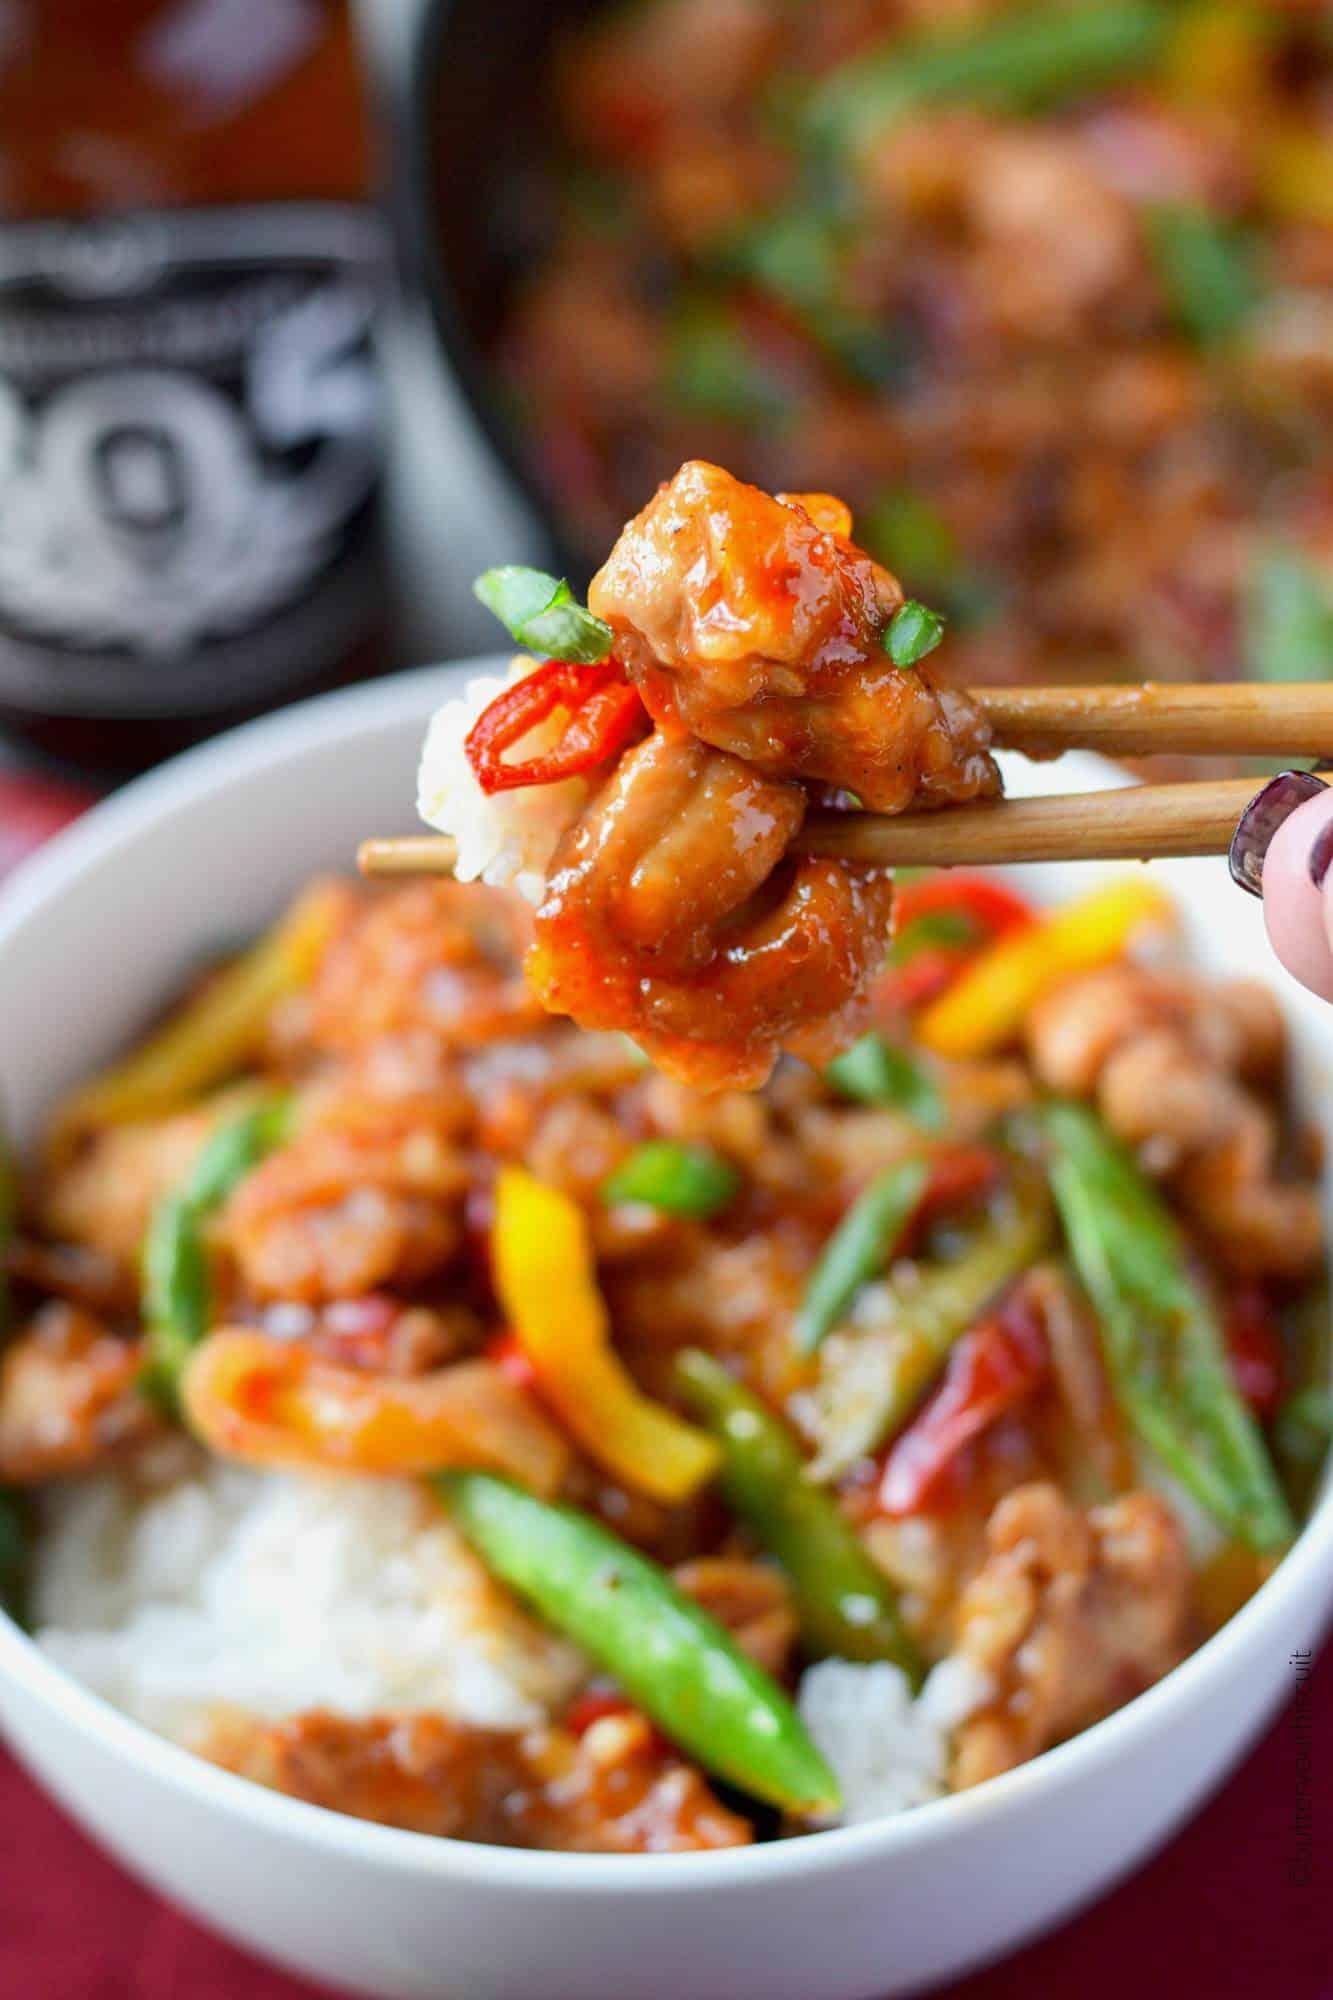 Sweet and Spicy chicken stir fry bite with chopsticks